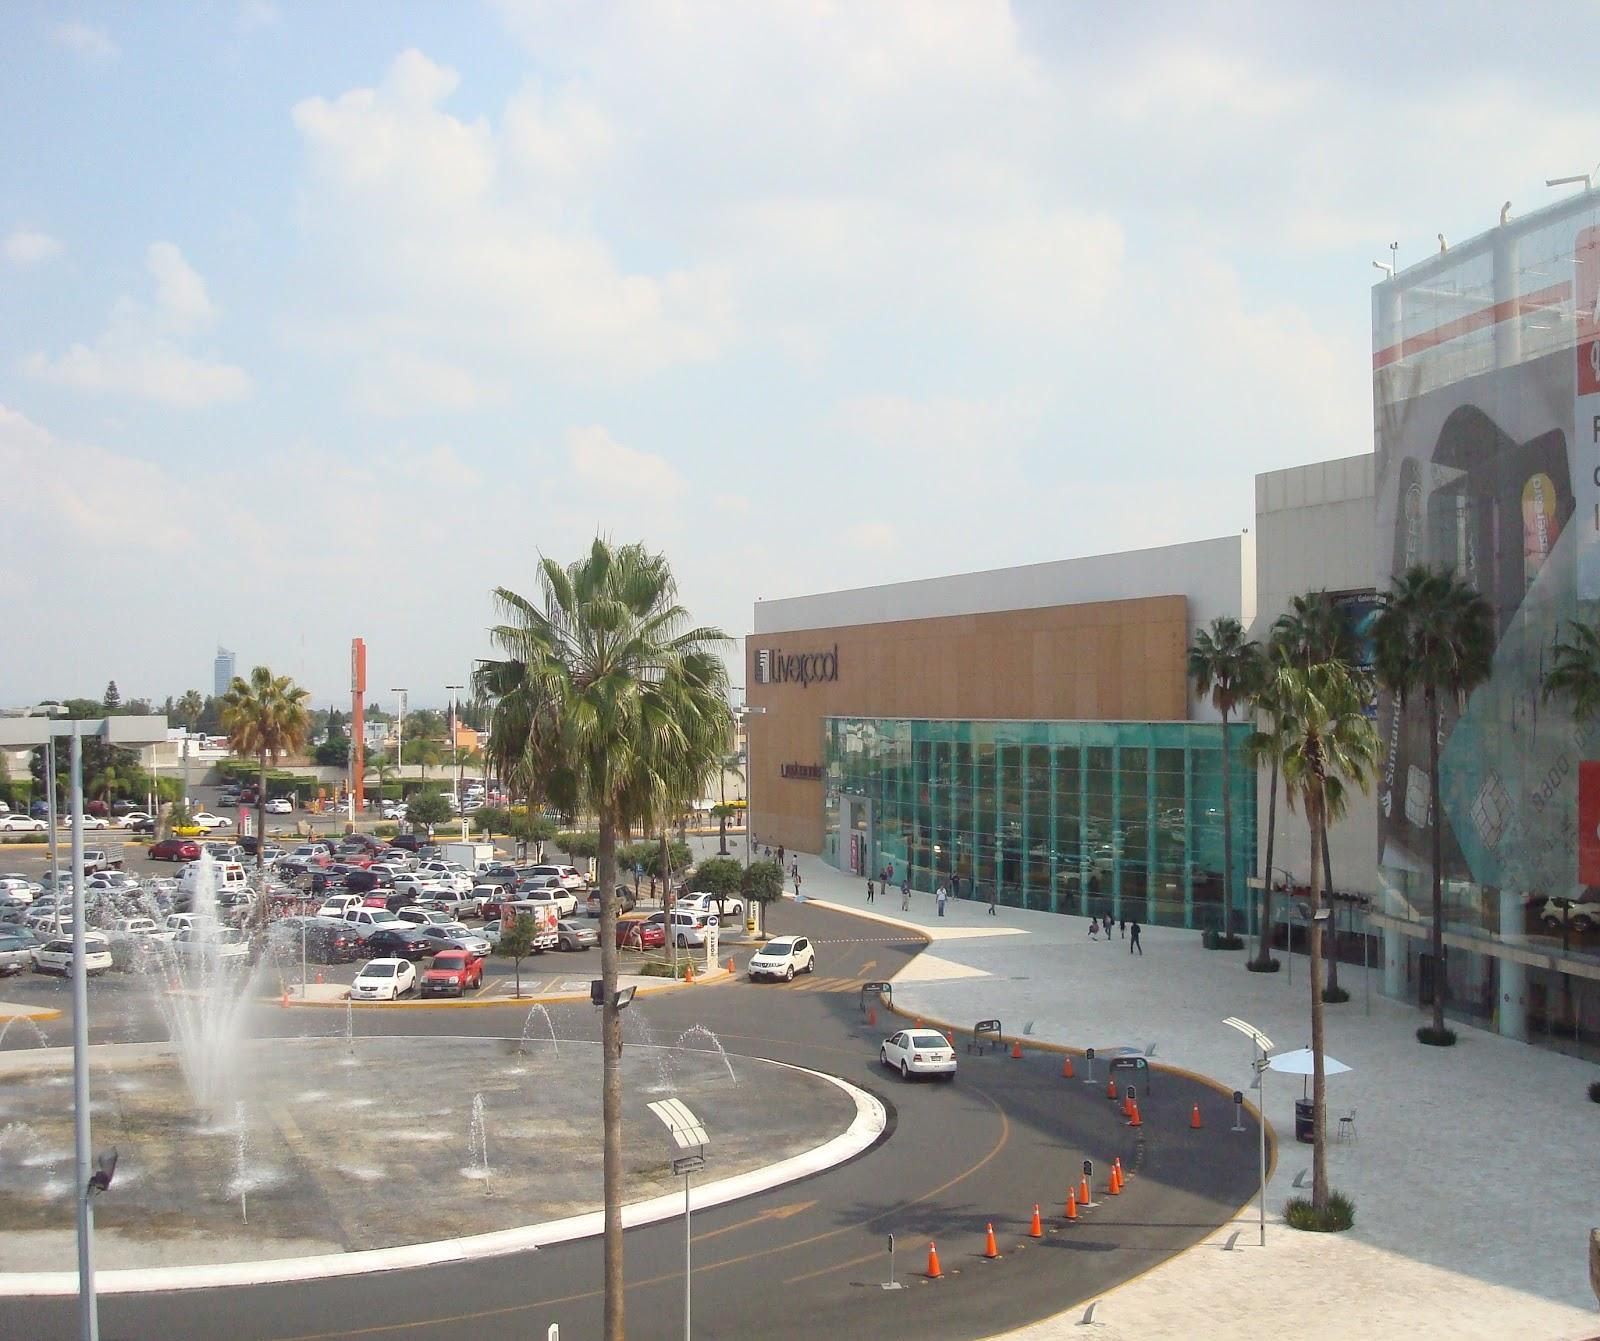 Sancarlosfortin Glorieta De Plaza Galerias En Guadalajara